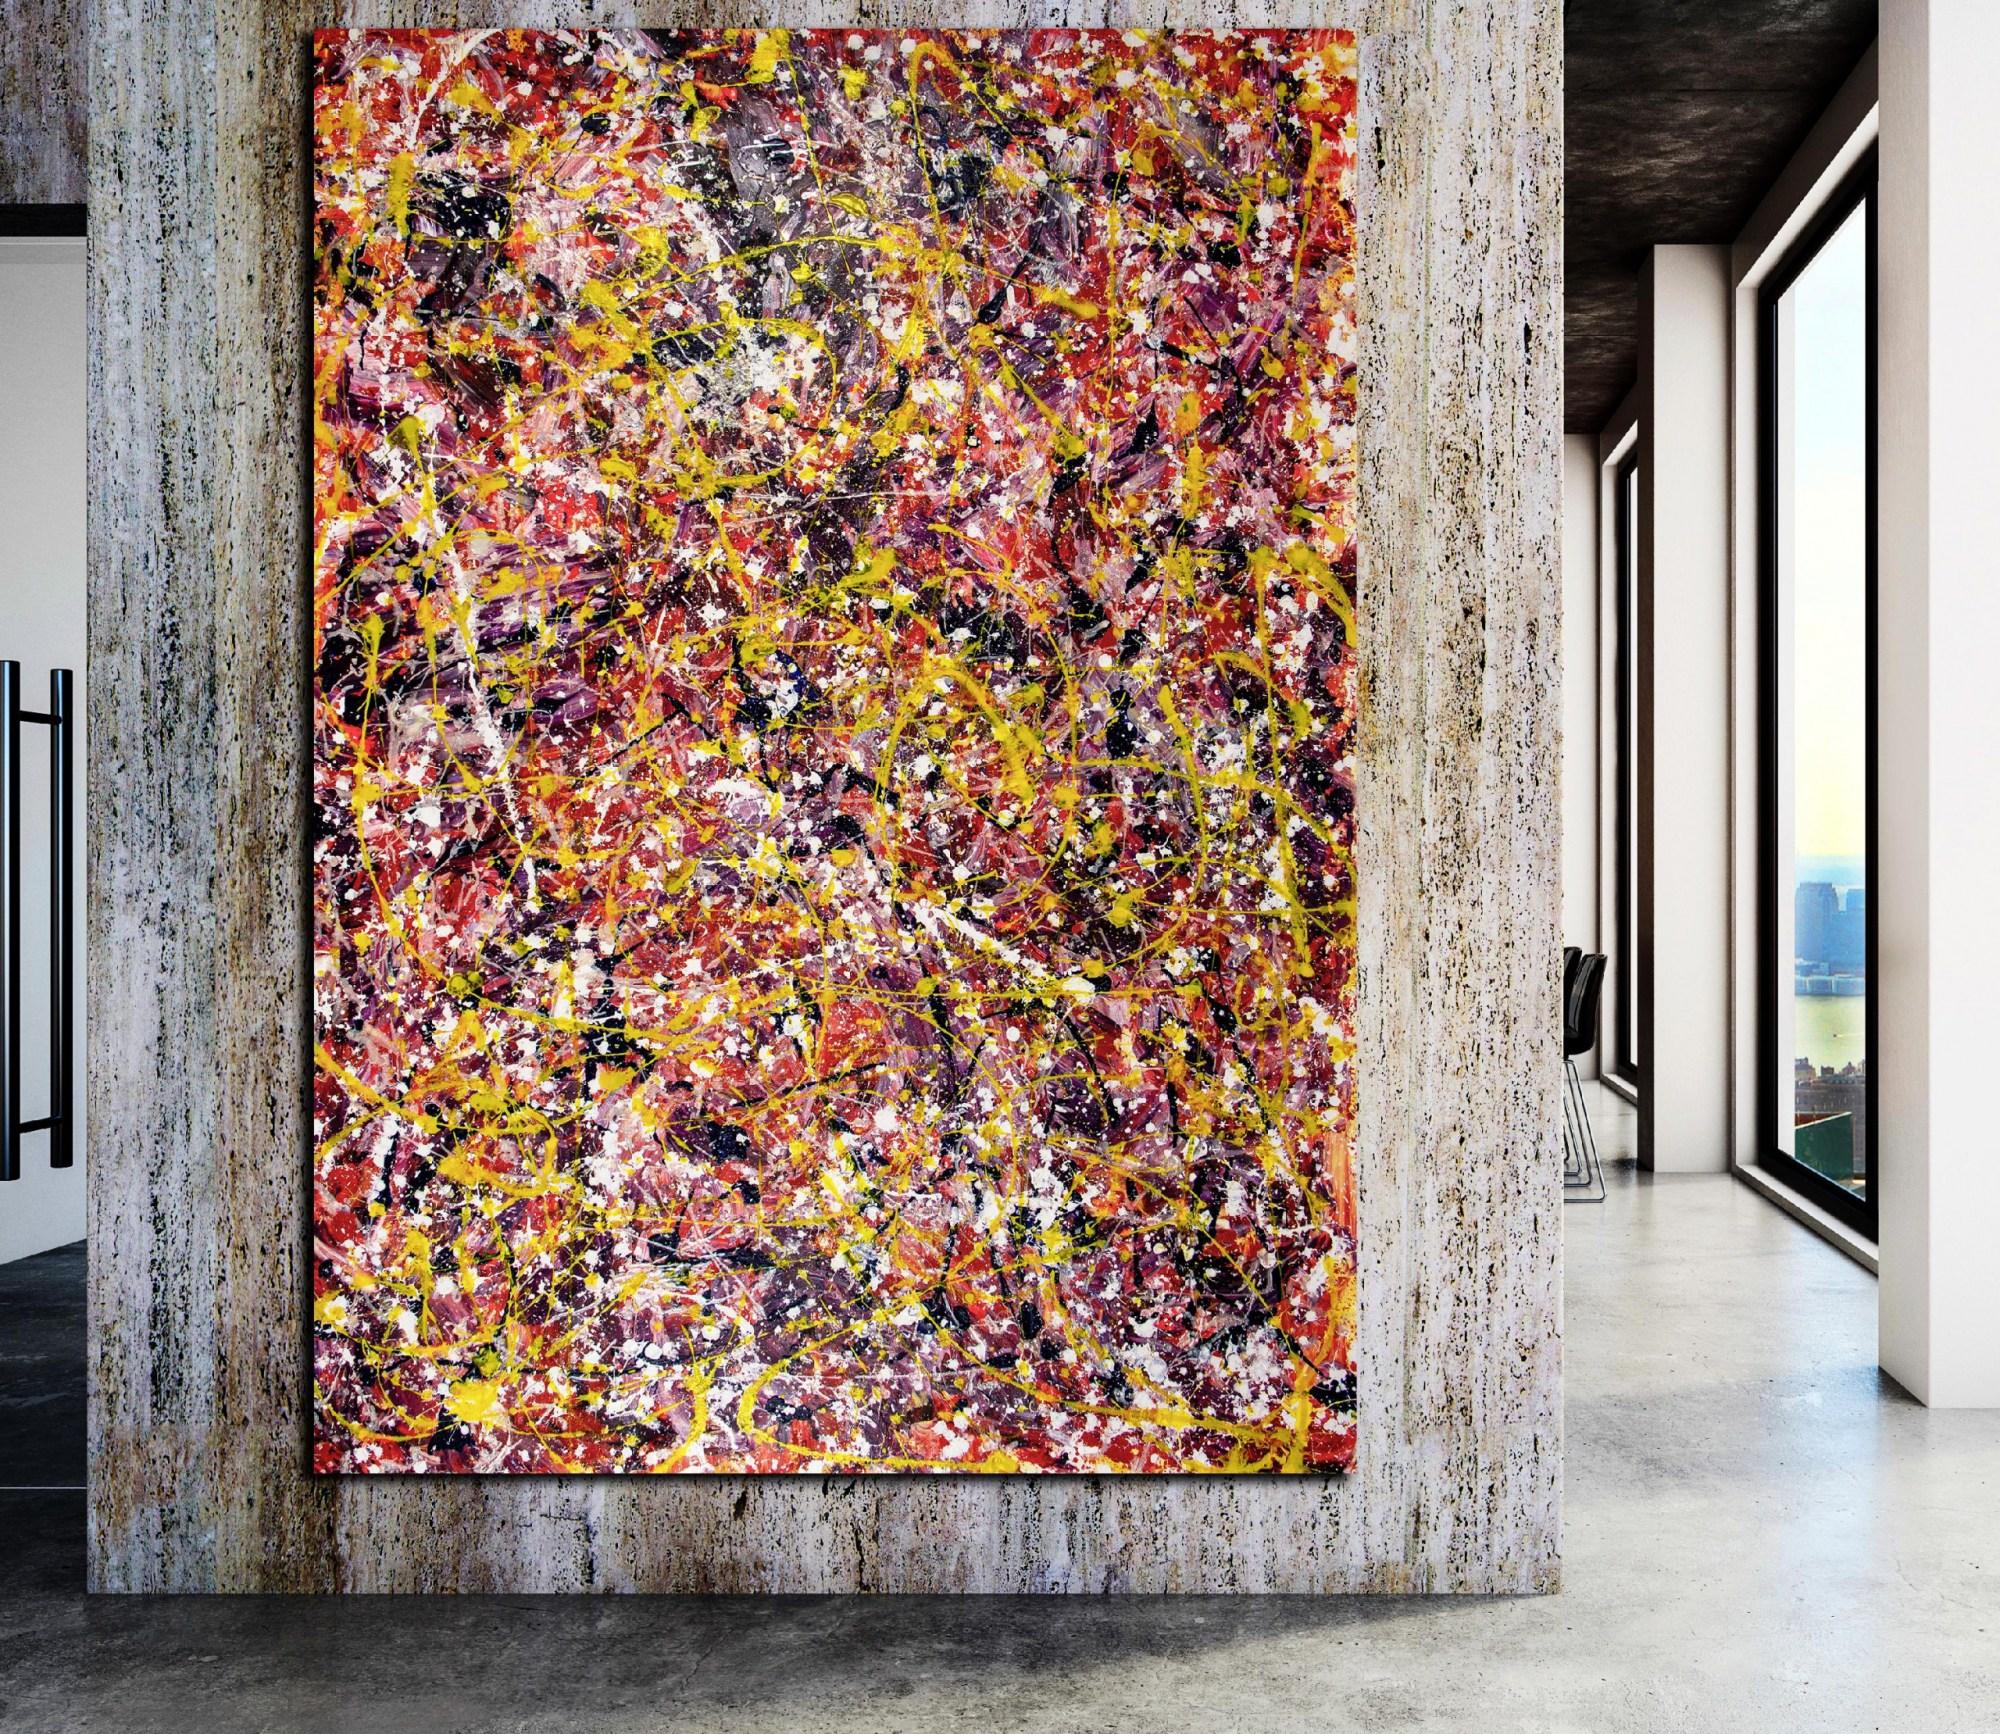 SOLD - Room example - Autumn Carousel (Autumnal Equinox) 2021 by Nestor Toro